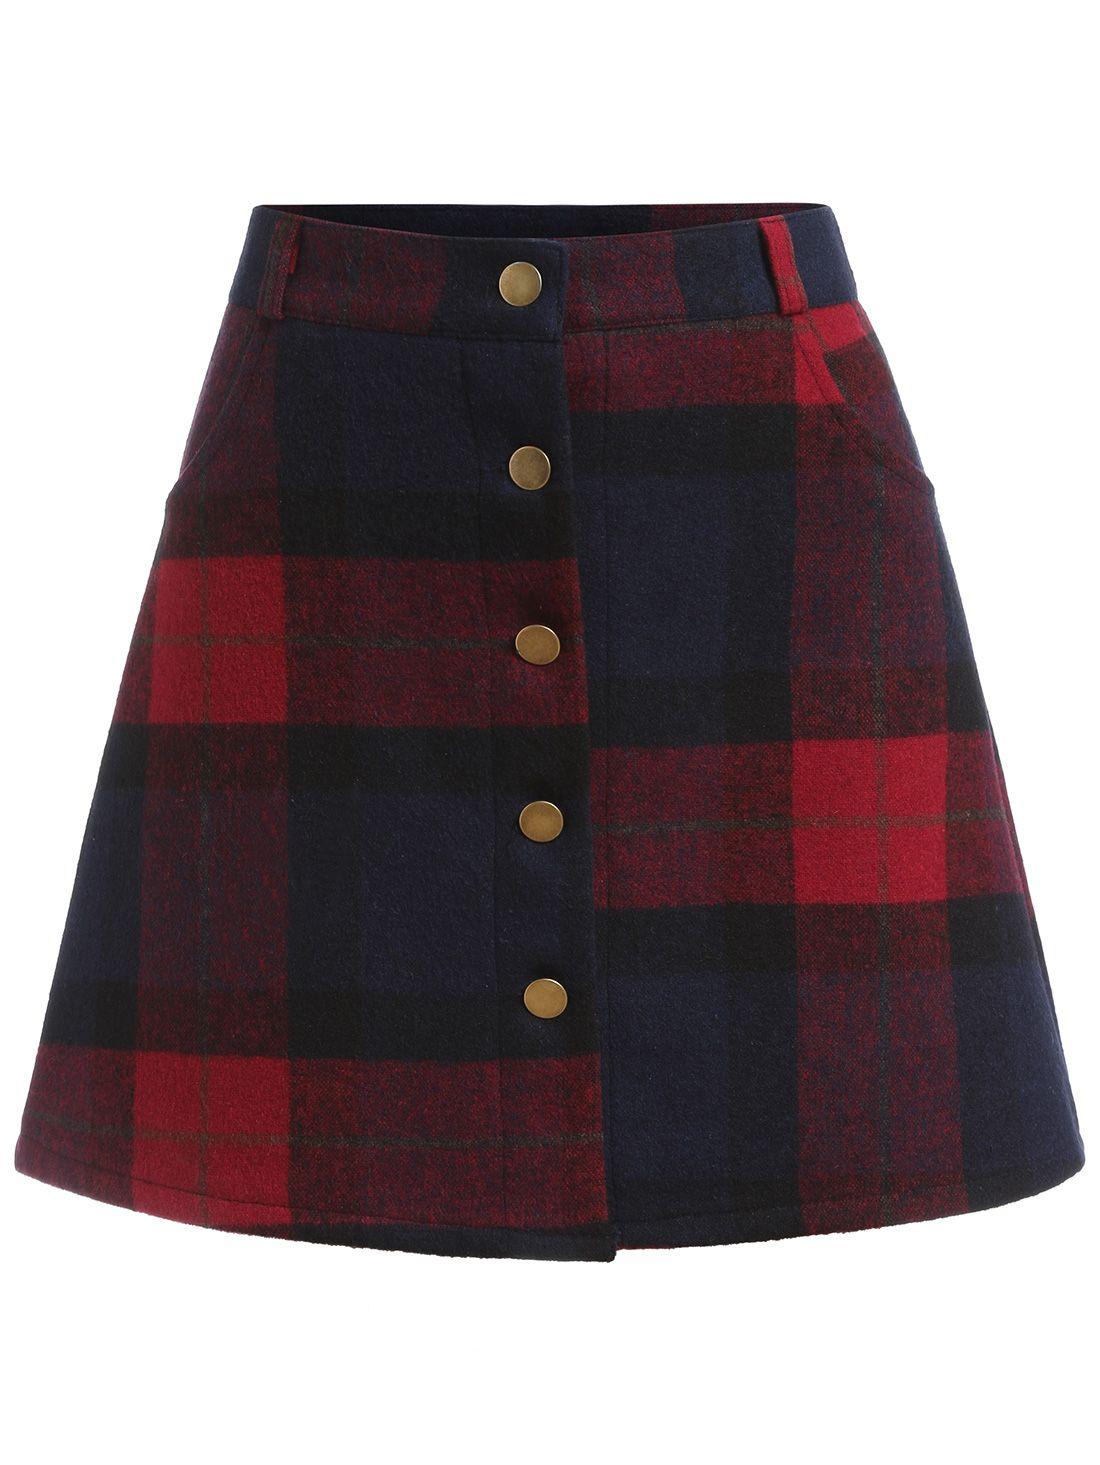 e8e9d887a falda línea A una fila de botón cuadrado | Cosas que me encantan ...